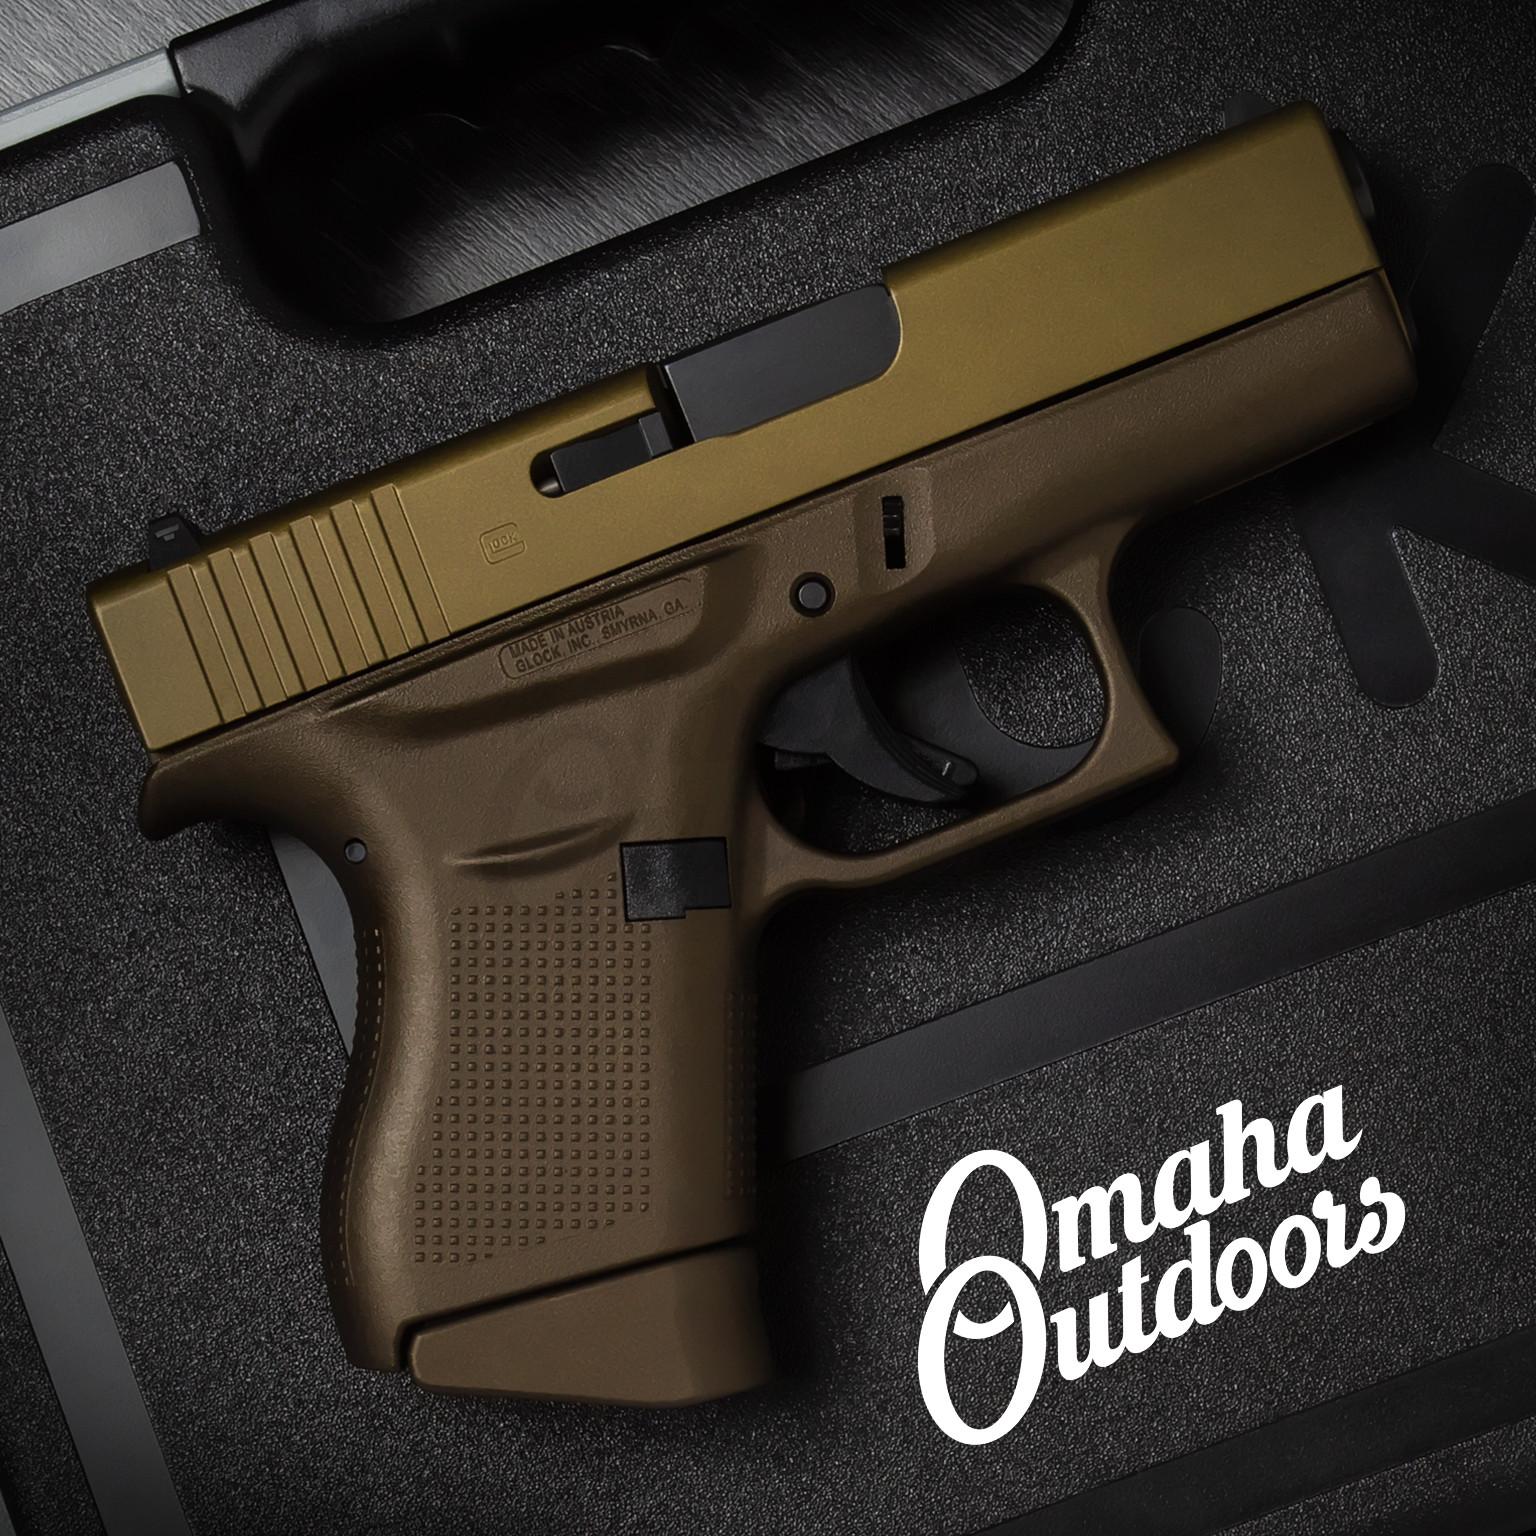 Glock 43 Spartan Bronze Pistol 9mm Burnt Bronze Slide 6 RD  PI4350201-SBZ-FR-BBZ-SL